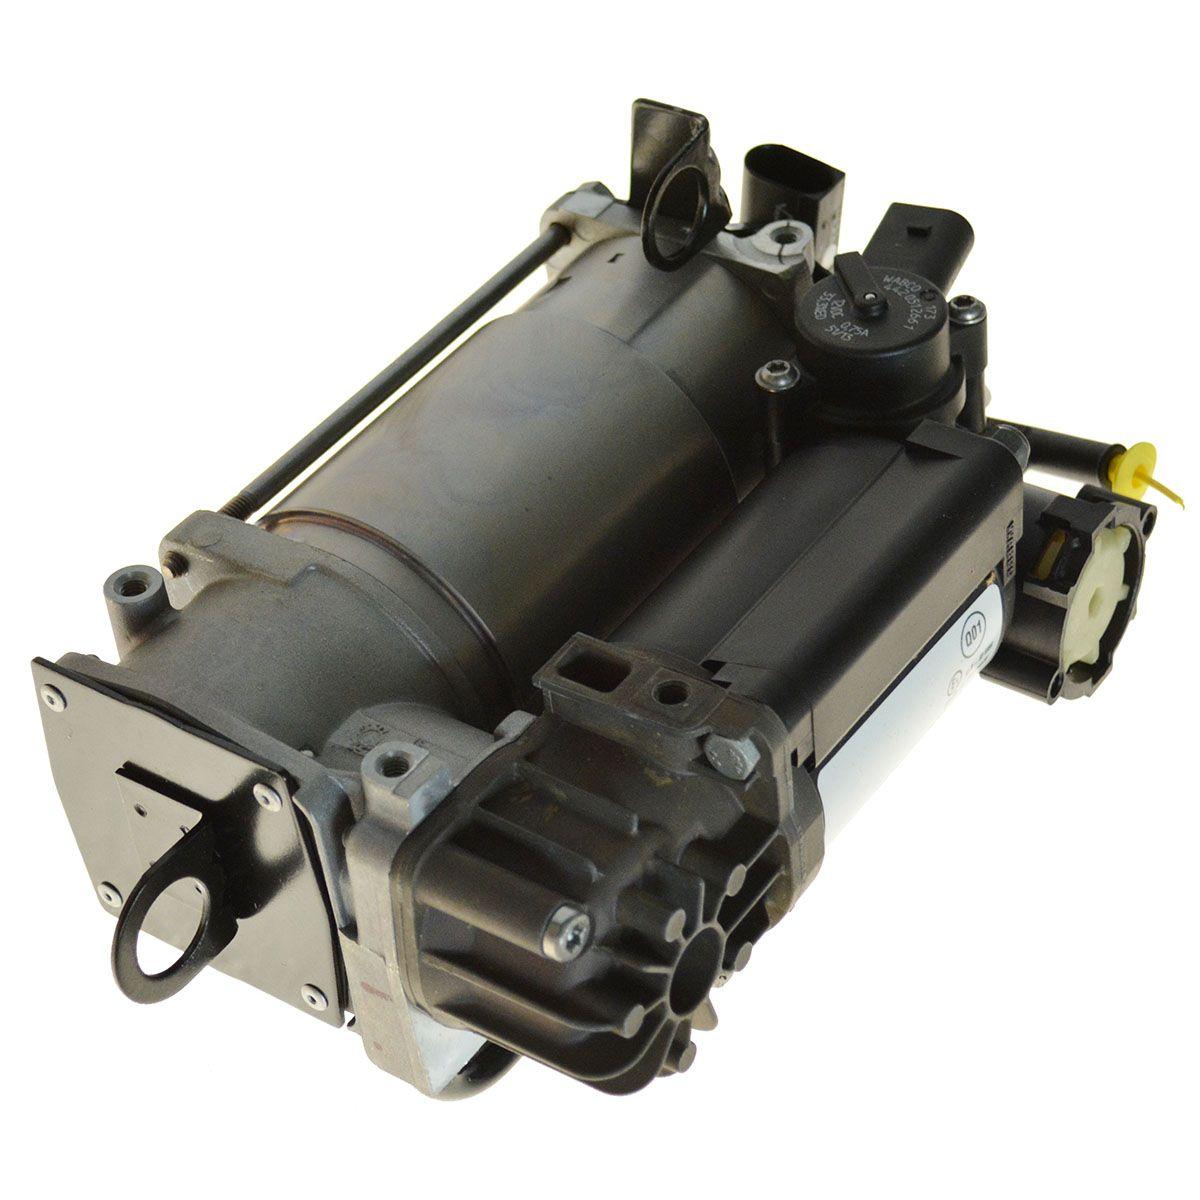 airmatic air ride suspension compressor arnott for mercedes cls e s class ebay. Black Bedroom Furniture Sets. Home Design Ideas